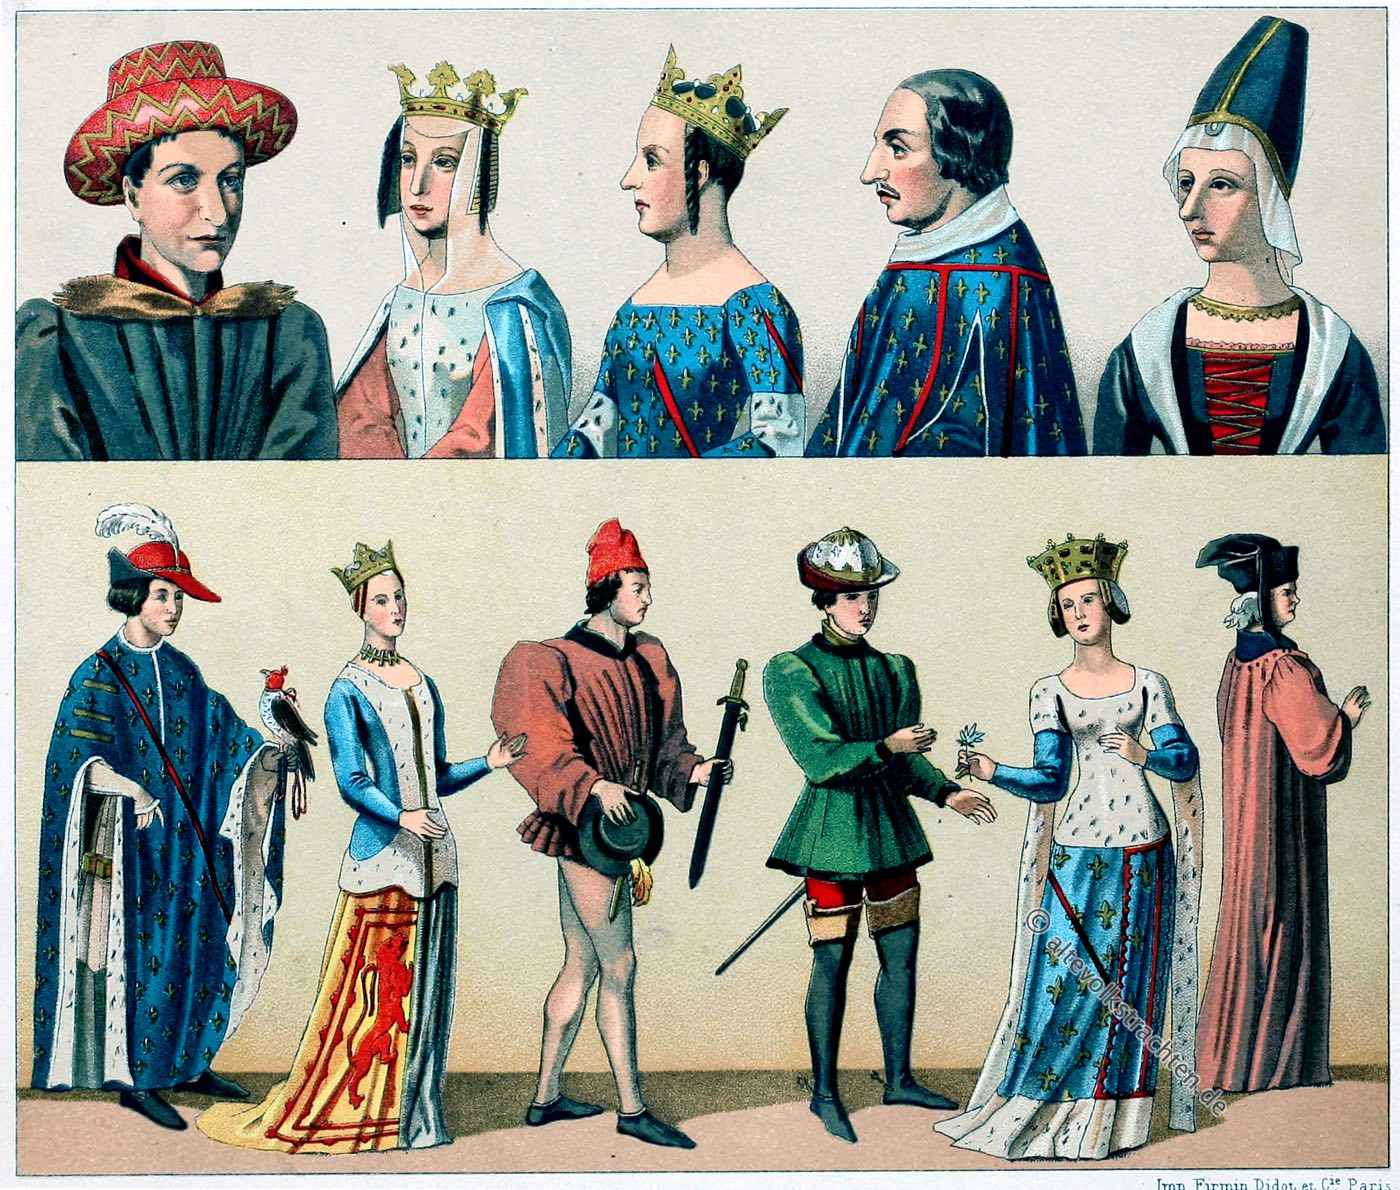 Mode, Kostüm, Mittelalter, 14. Jahrhundert, Hennin, Modegeschichte, Auguste Racinet